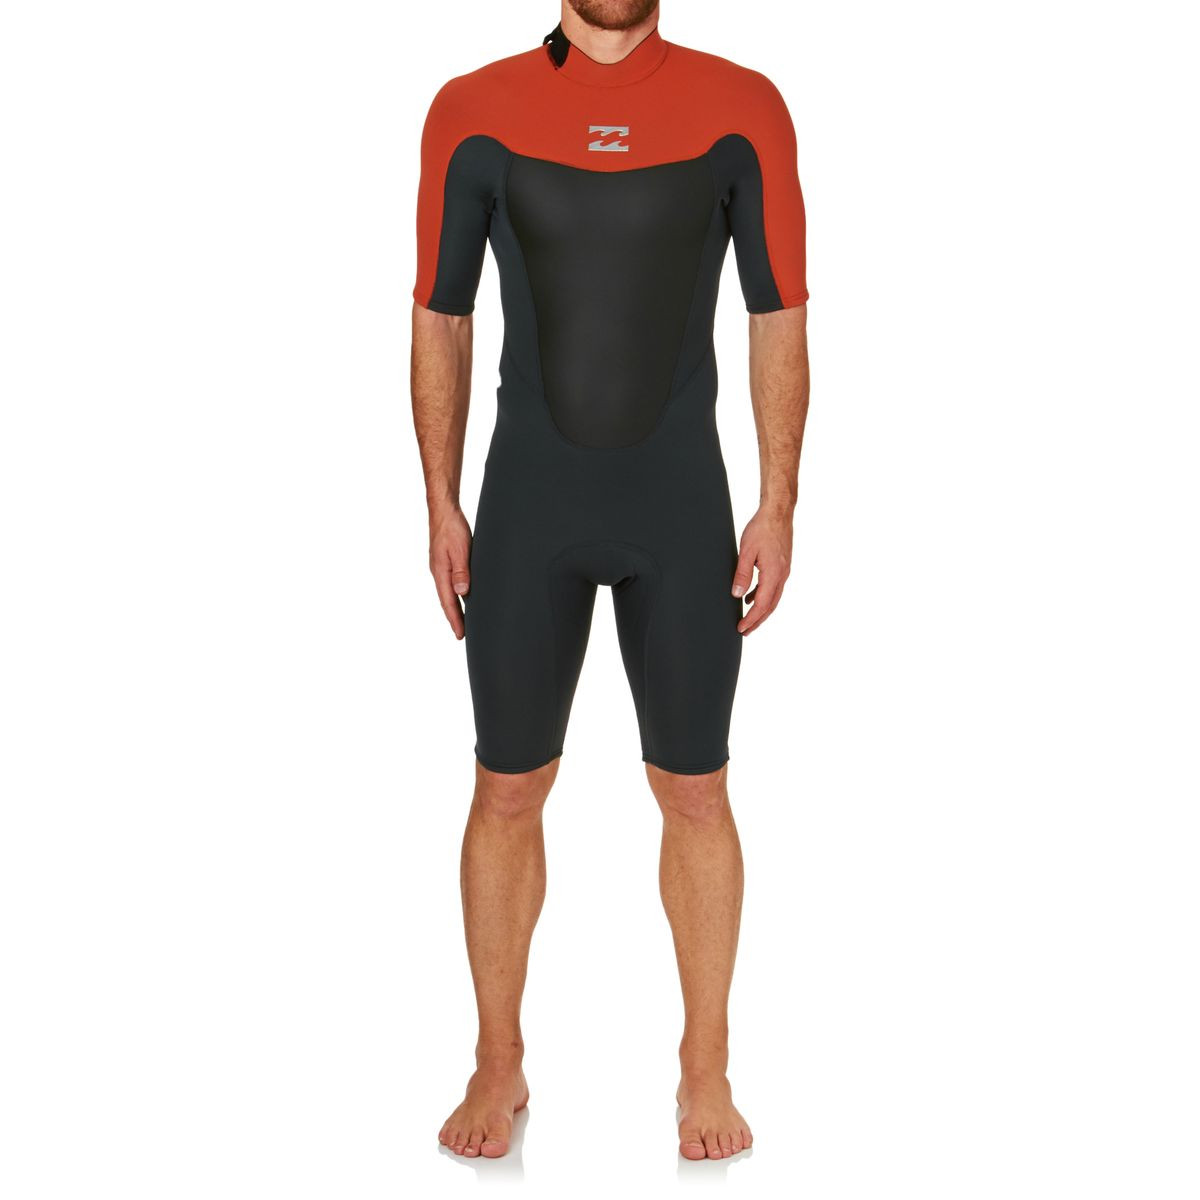 Billabong Absolute Comp 2mm 2017 Back Zip Short Sleeve Shorty Wetsuit - Orange